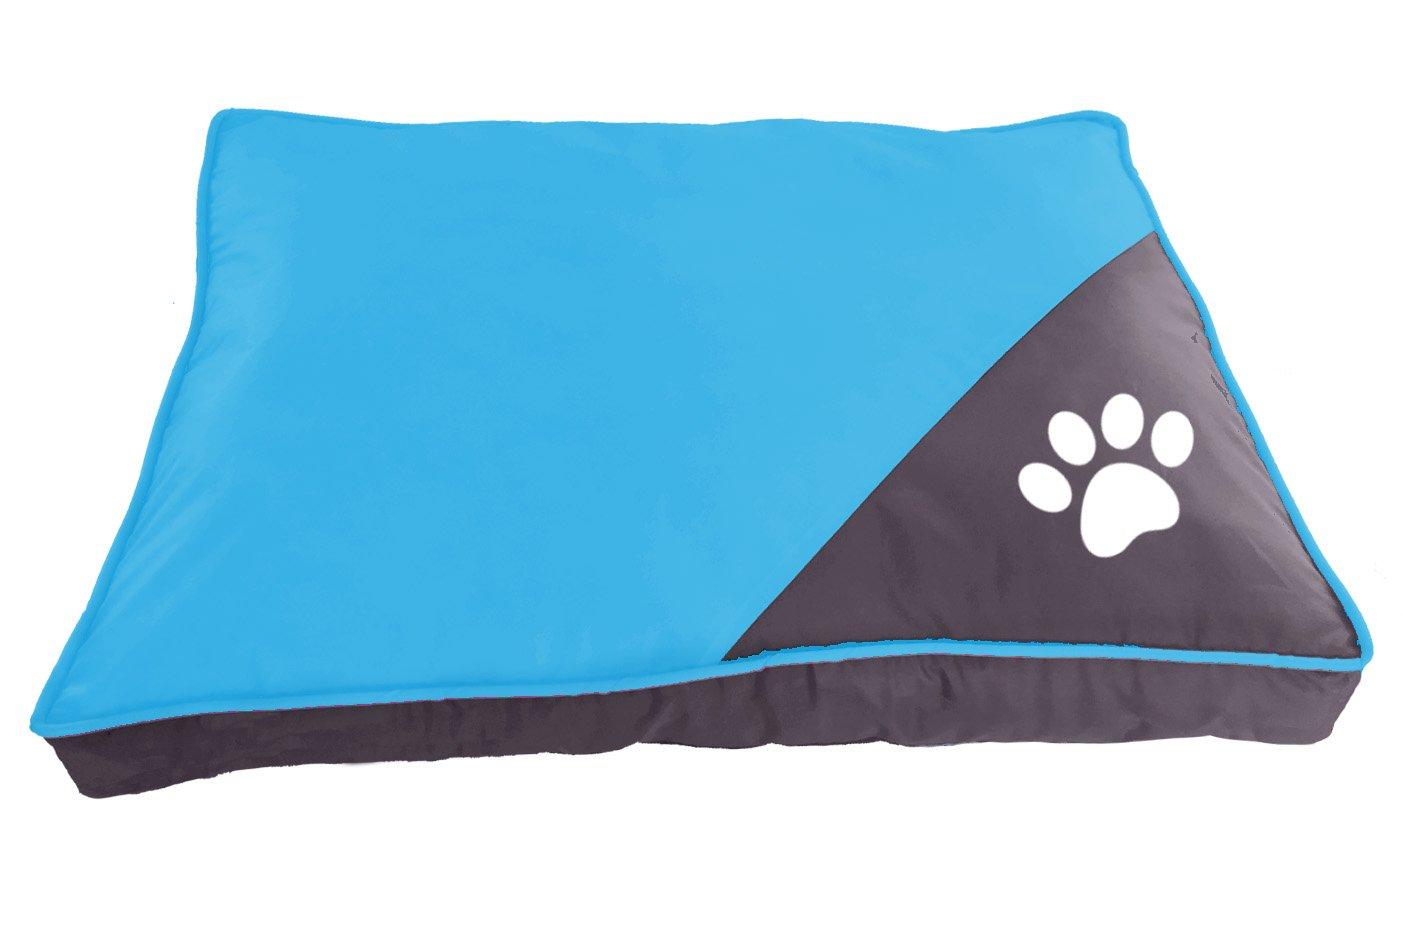 L, Azul BPS-1595AZ BPS Colchoneta Cuna para Perros Mascotas de Verano Cama Colch/ón Manta Sof/á Suave con Material Tela Oxford Varios Colores y 2 Medidas para Elegir